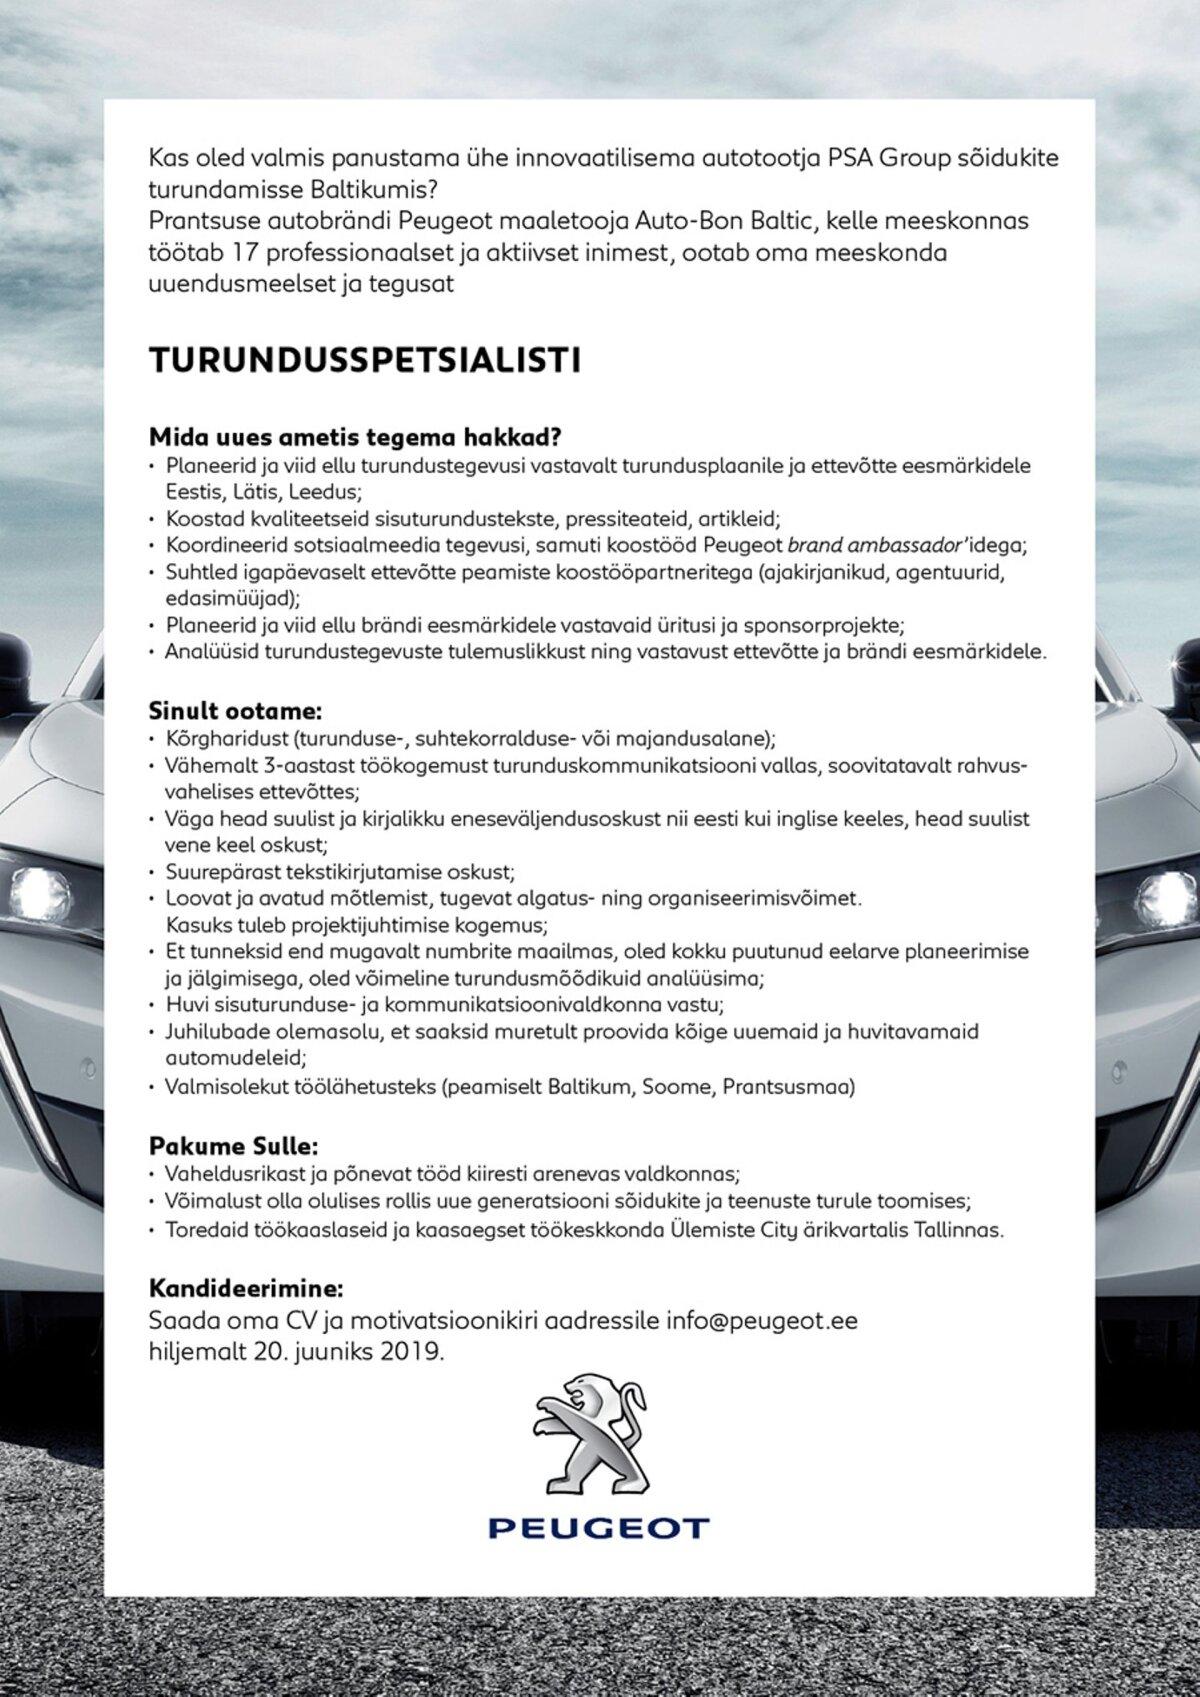 8c3fafb70d1 Auto-Bon Baltic otsib turundusspetsialisti